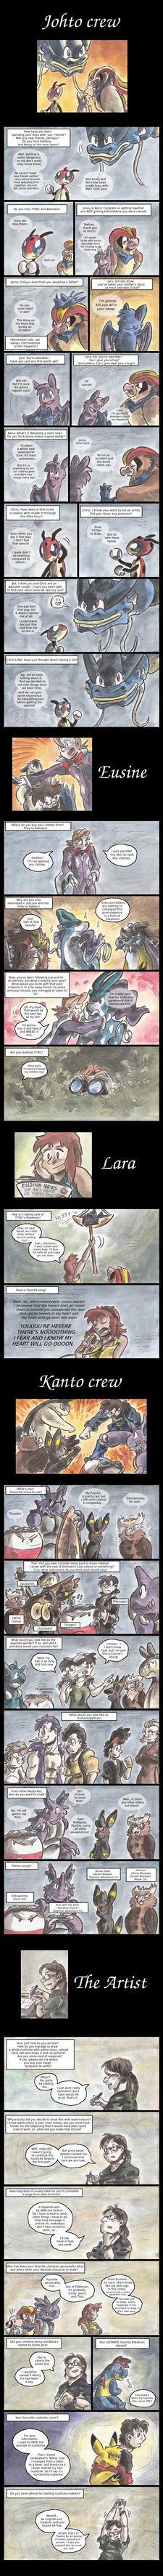 YTWC's Nuzlocke: Q+A II part 2 by Yamashita-akaDoragon